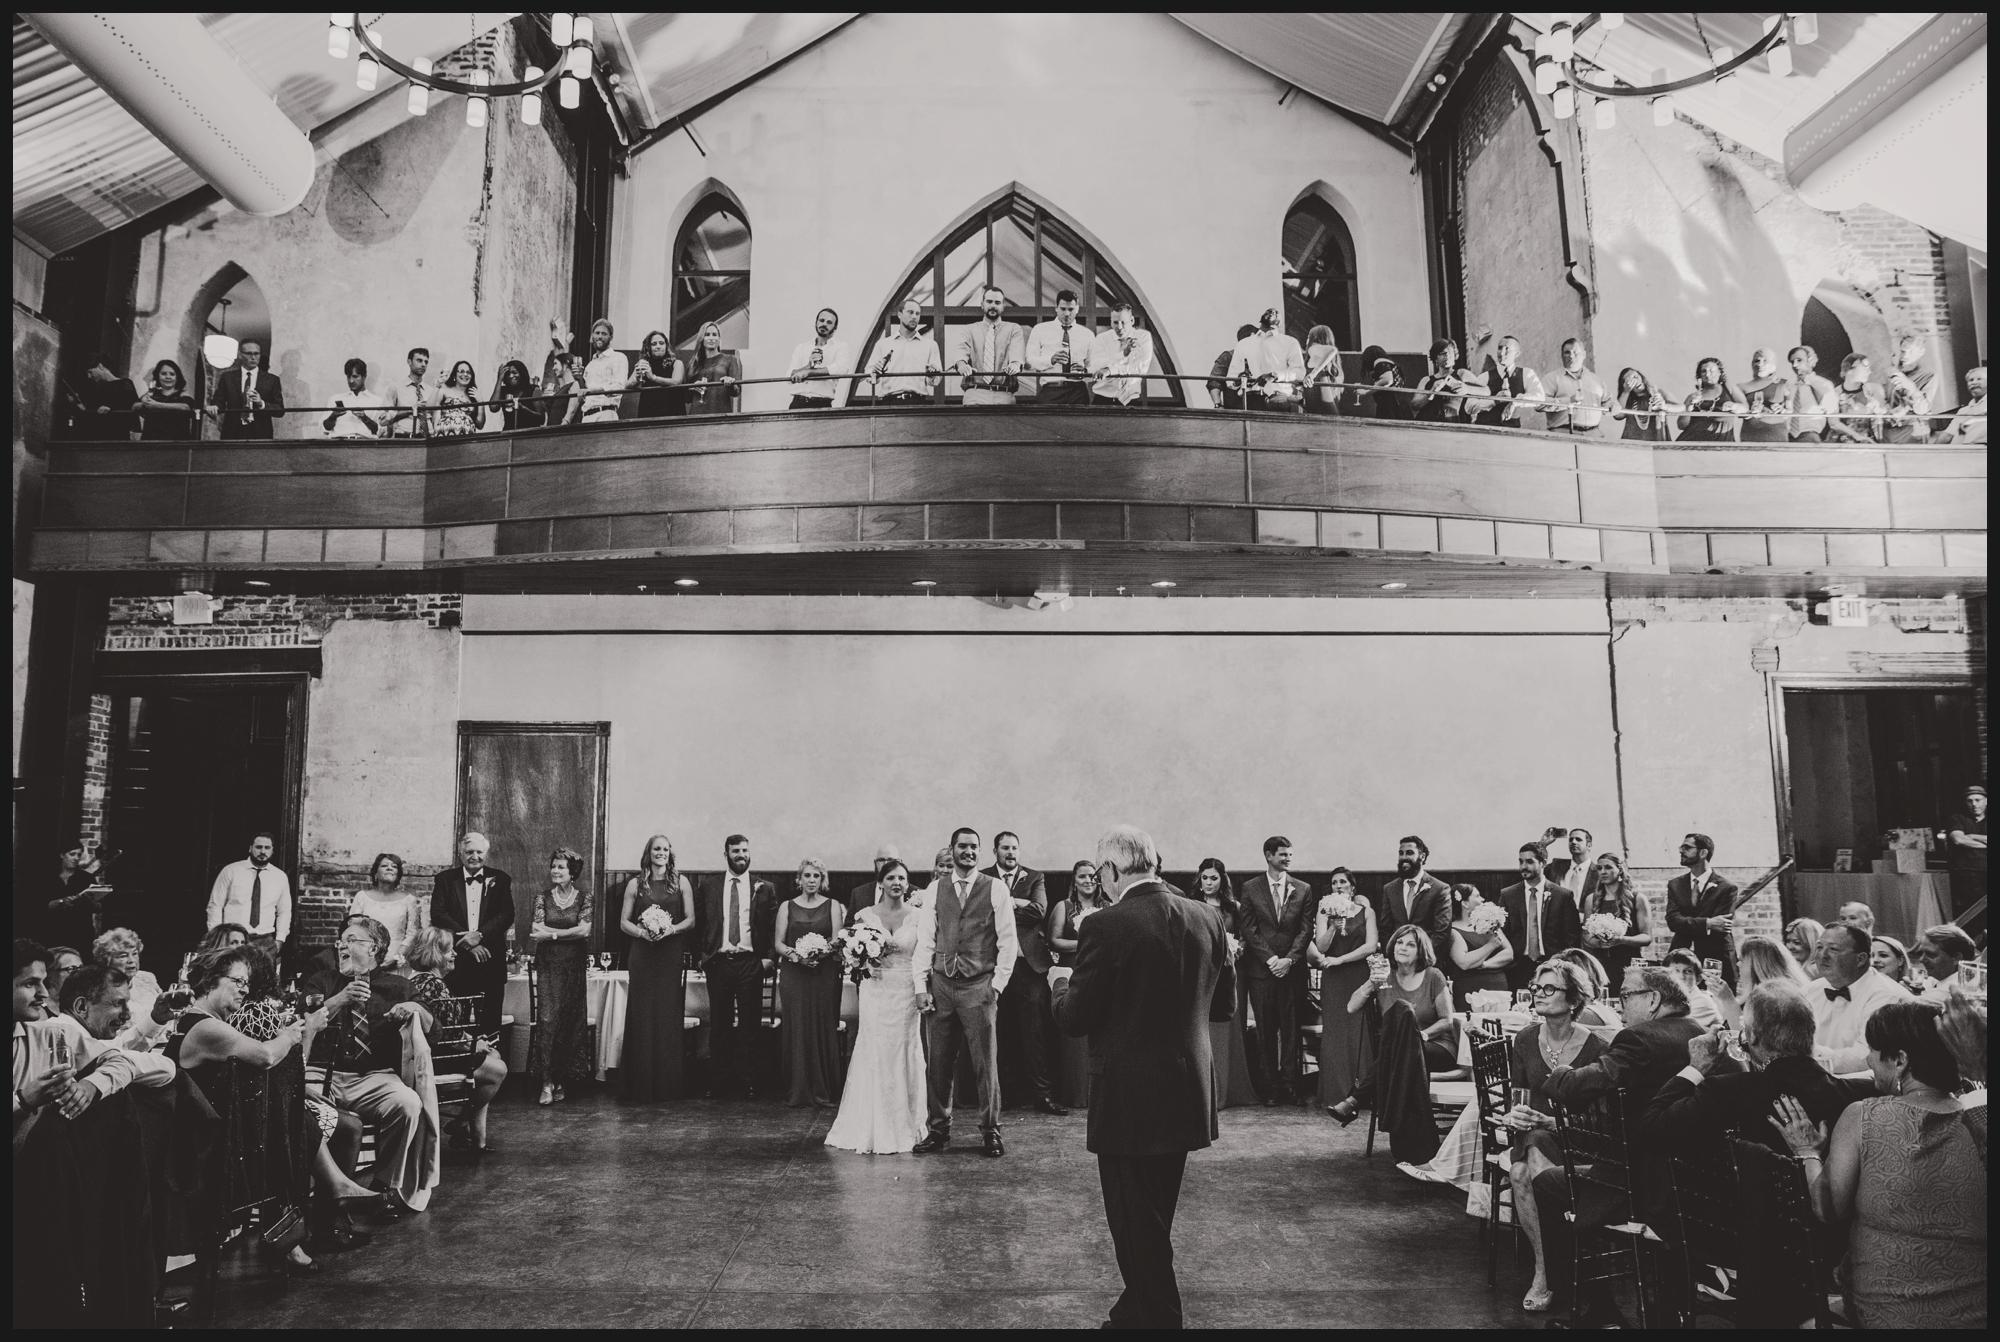 Orlando-Wedding-Photographer-destination-wedding-photographer-florida-wedding-photographer-bohemian-wedding-photographer_0651.jpg